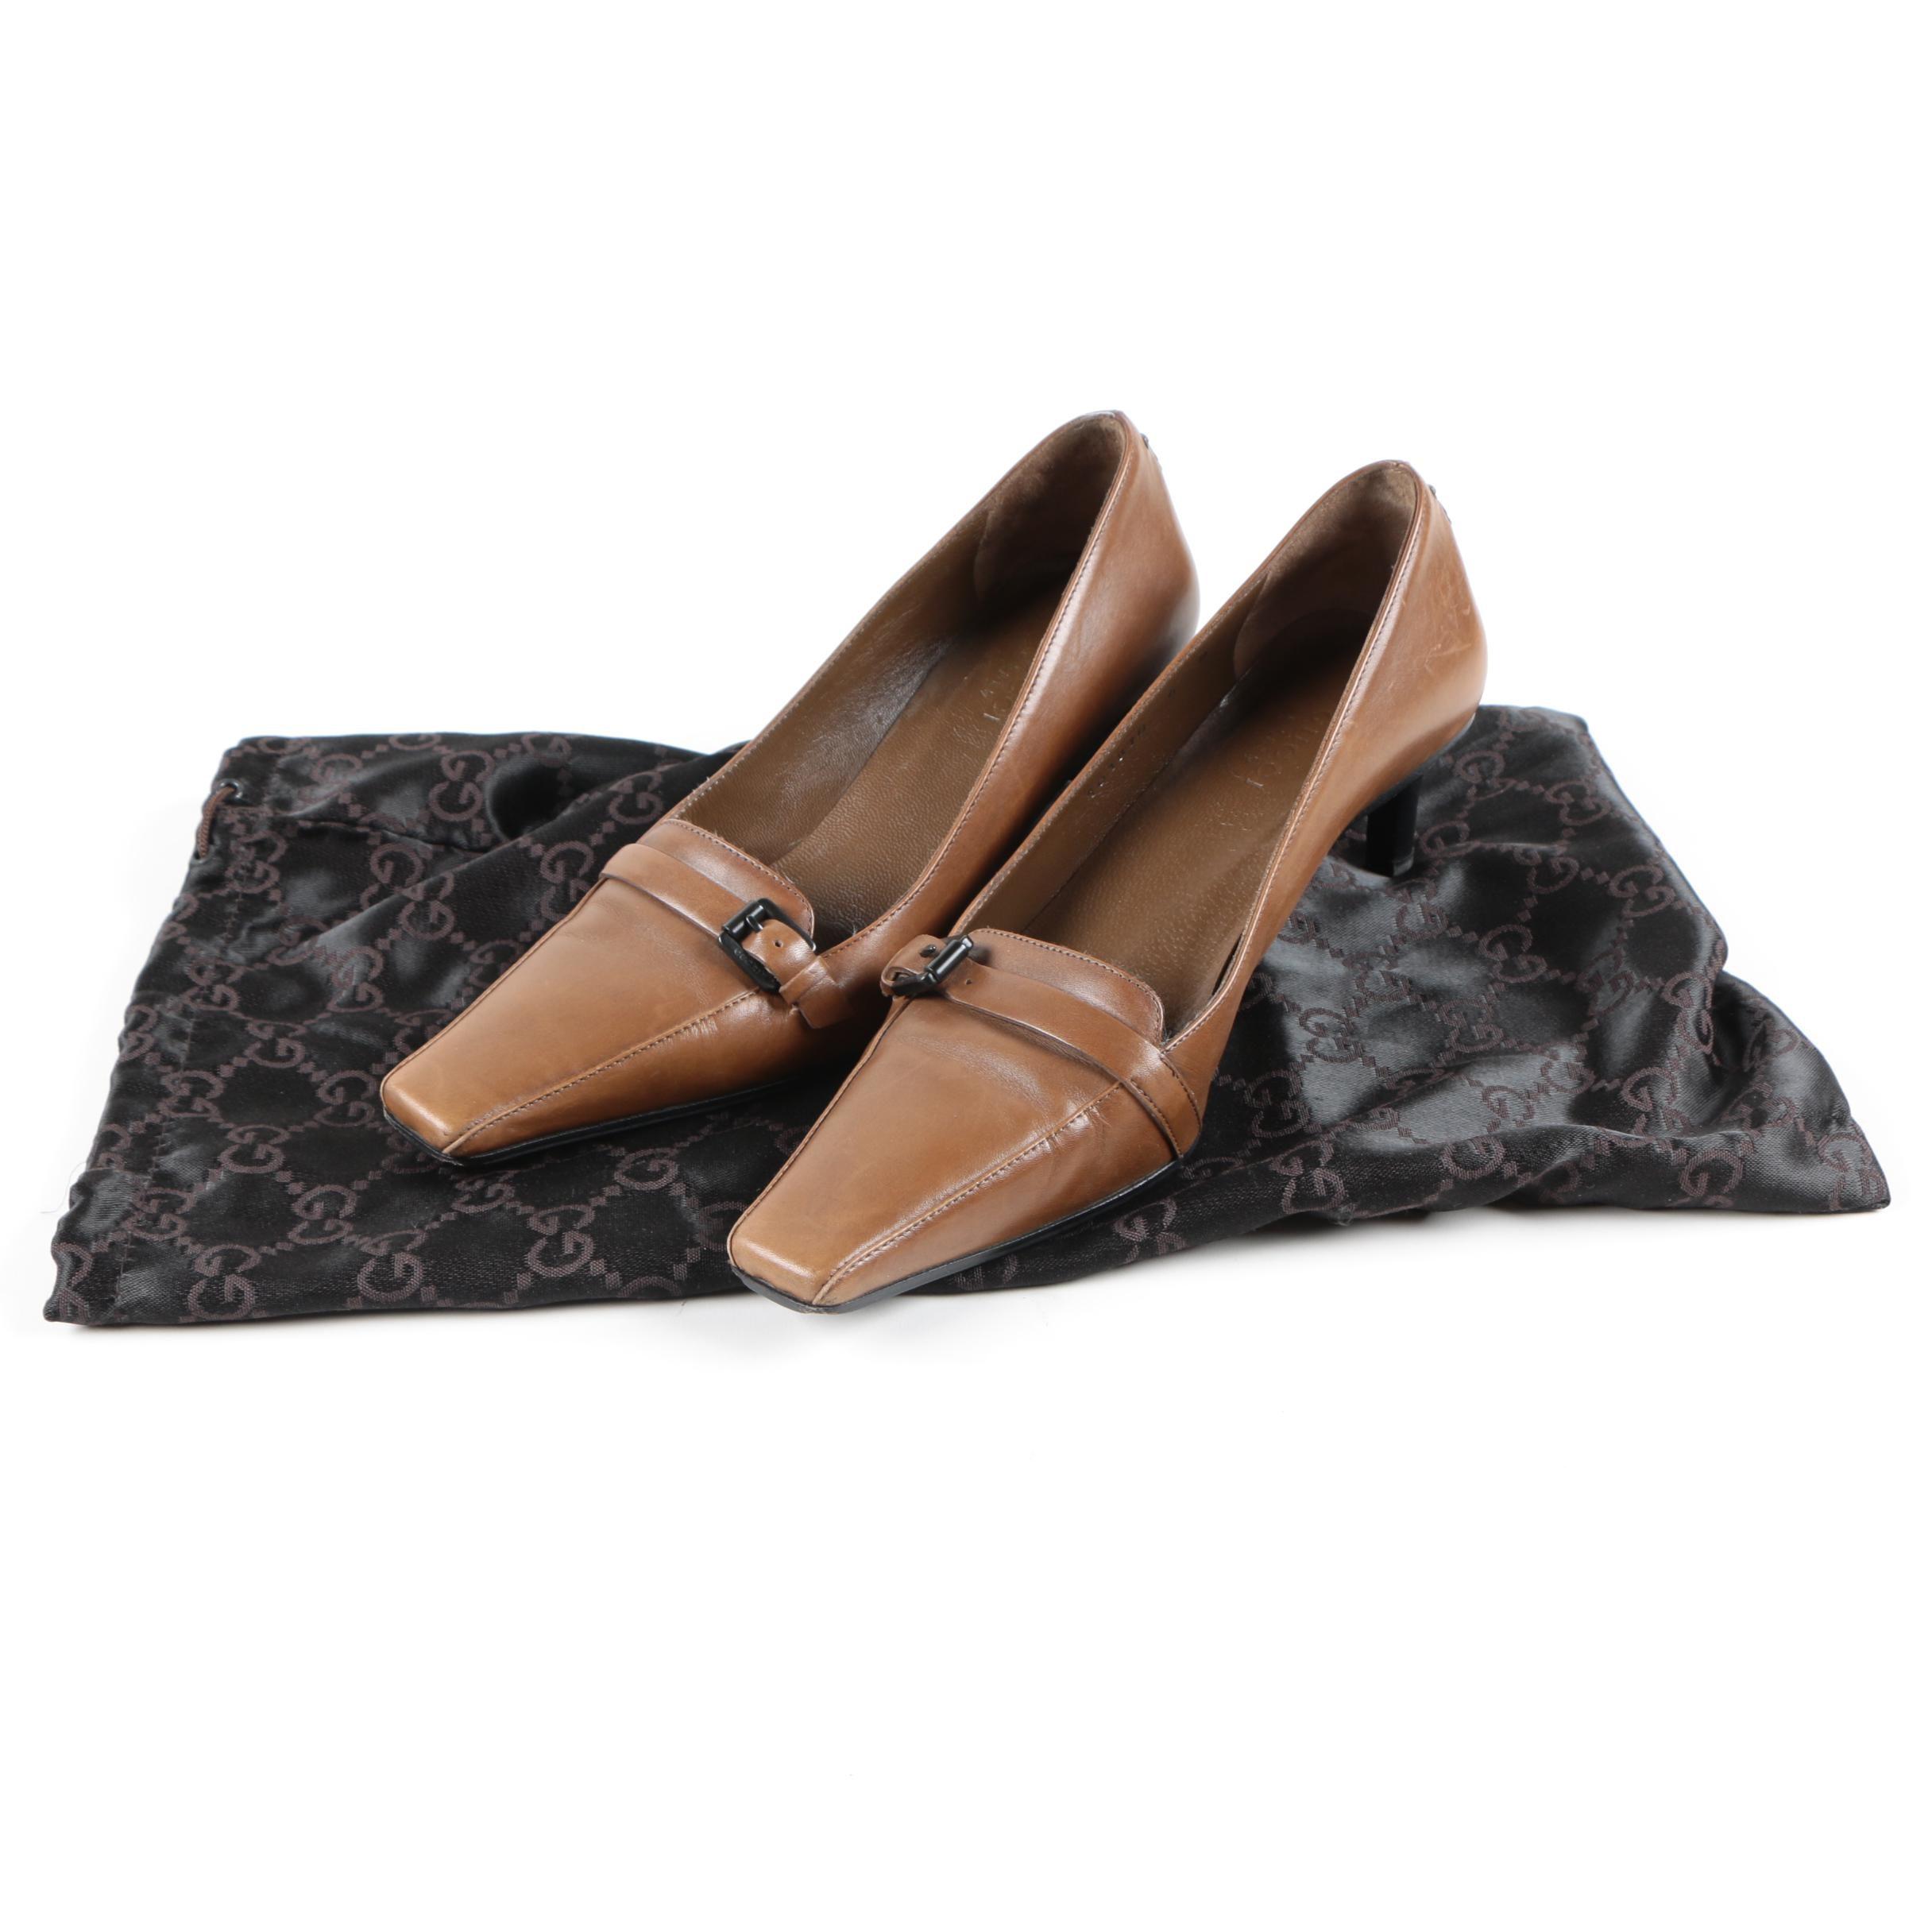 Gucci Brown Leather Kitten Heels